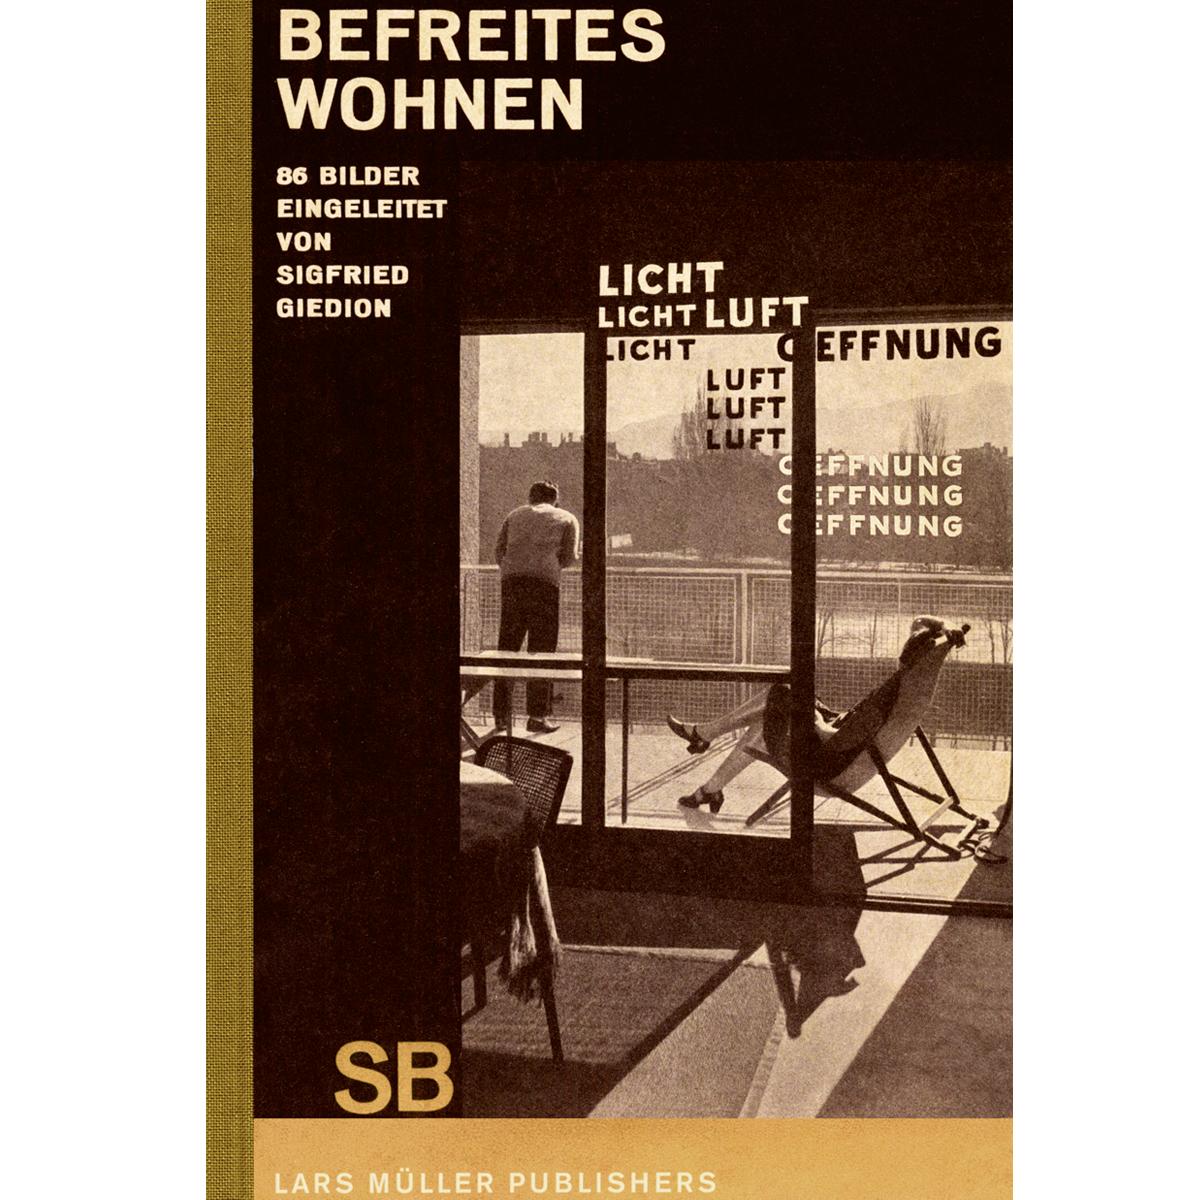 Sigfried Giedion: Liberated  Dwelling (+ Befreites Wohnen)